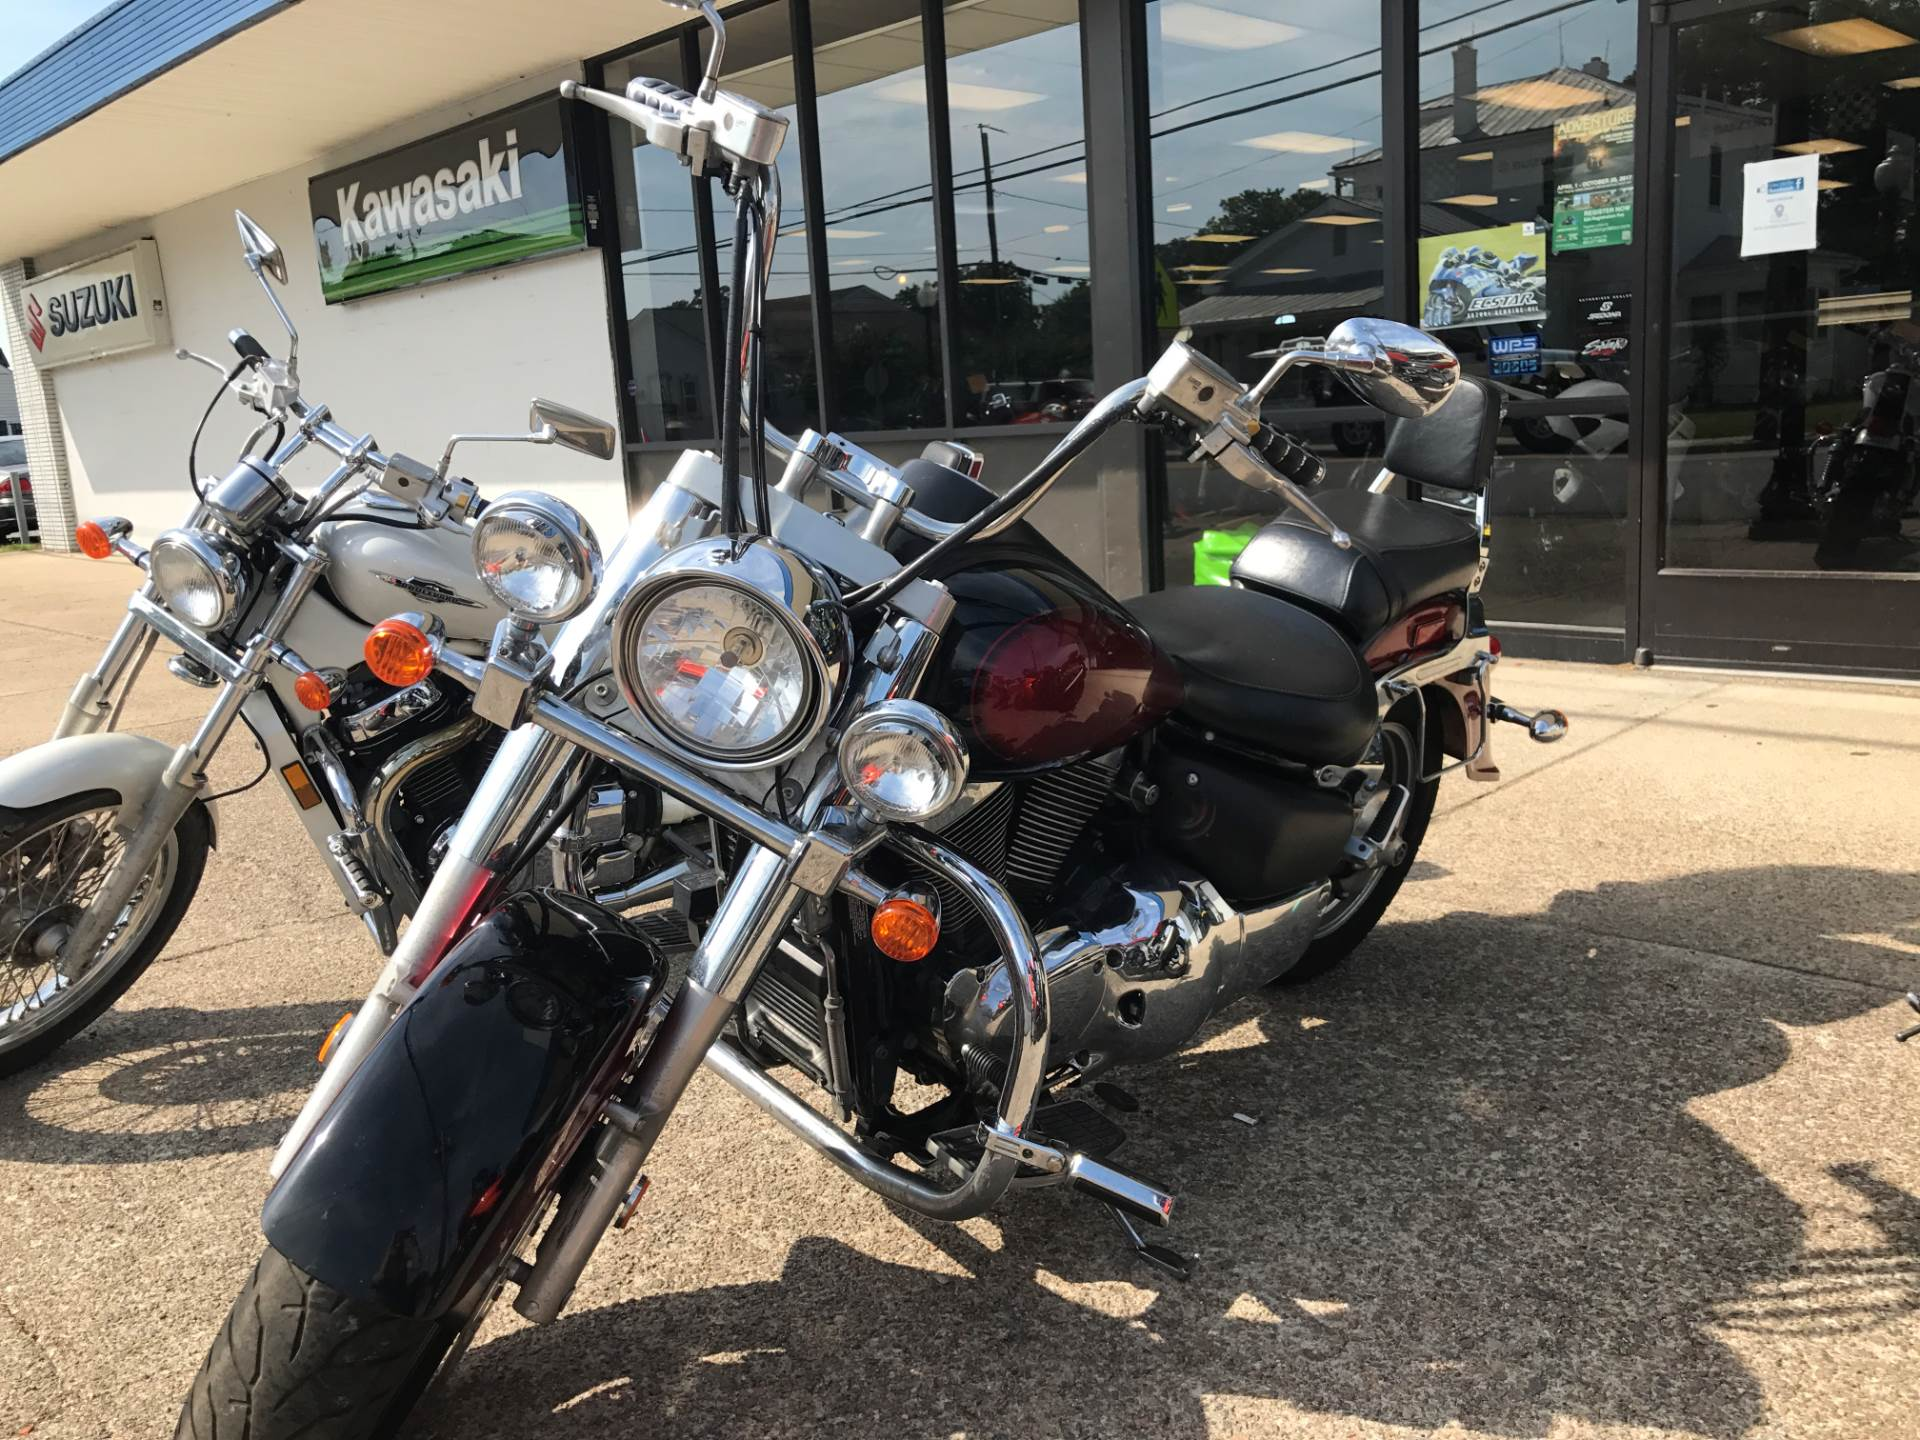 Used 2007 Suzuki Boulevard C90 Motorcycles in Highland Springs, VA ...